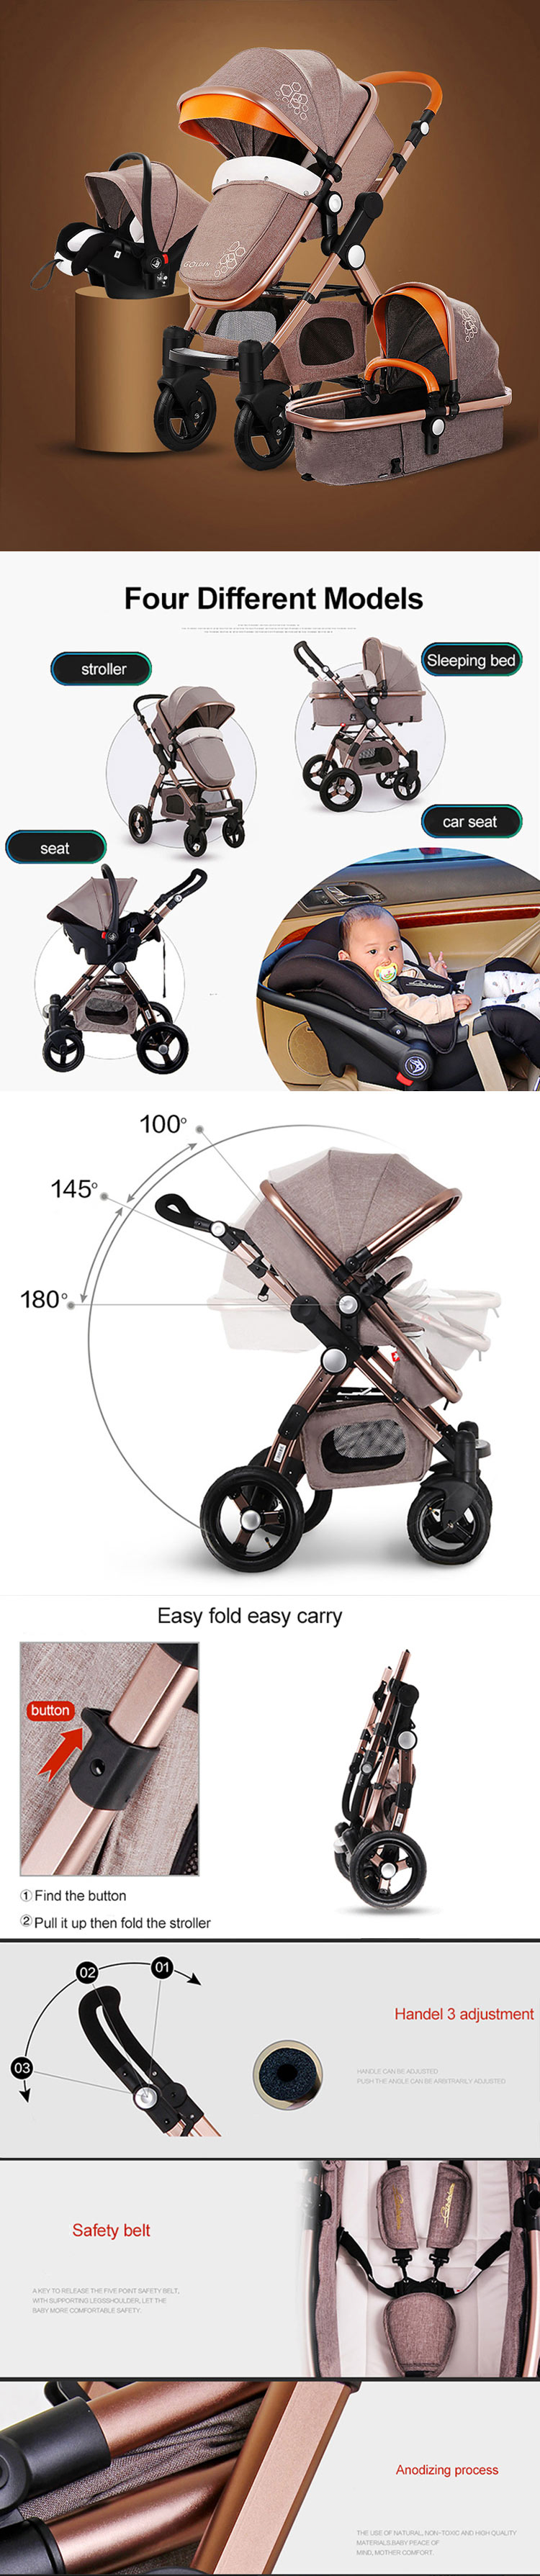 Cheap  magicbebe smart baby stroller/Multi-Functional  Portable BabyDoll  Stroller Pram/Travel  System Baby stroller